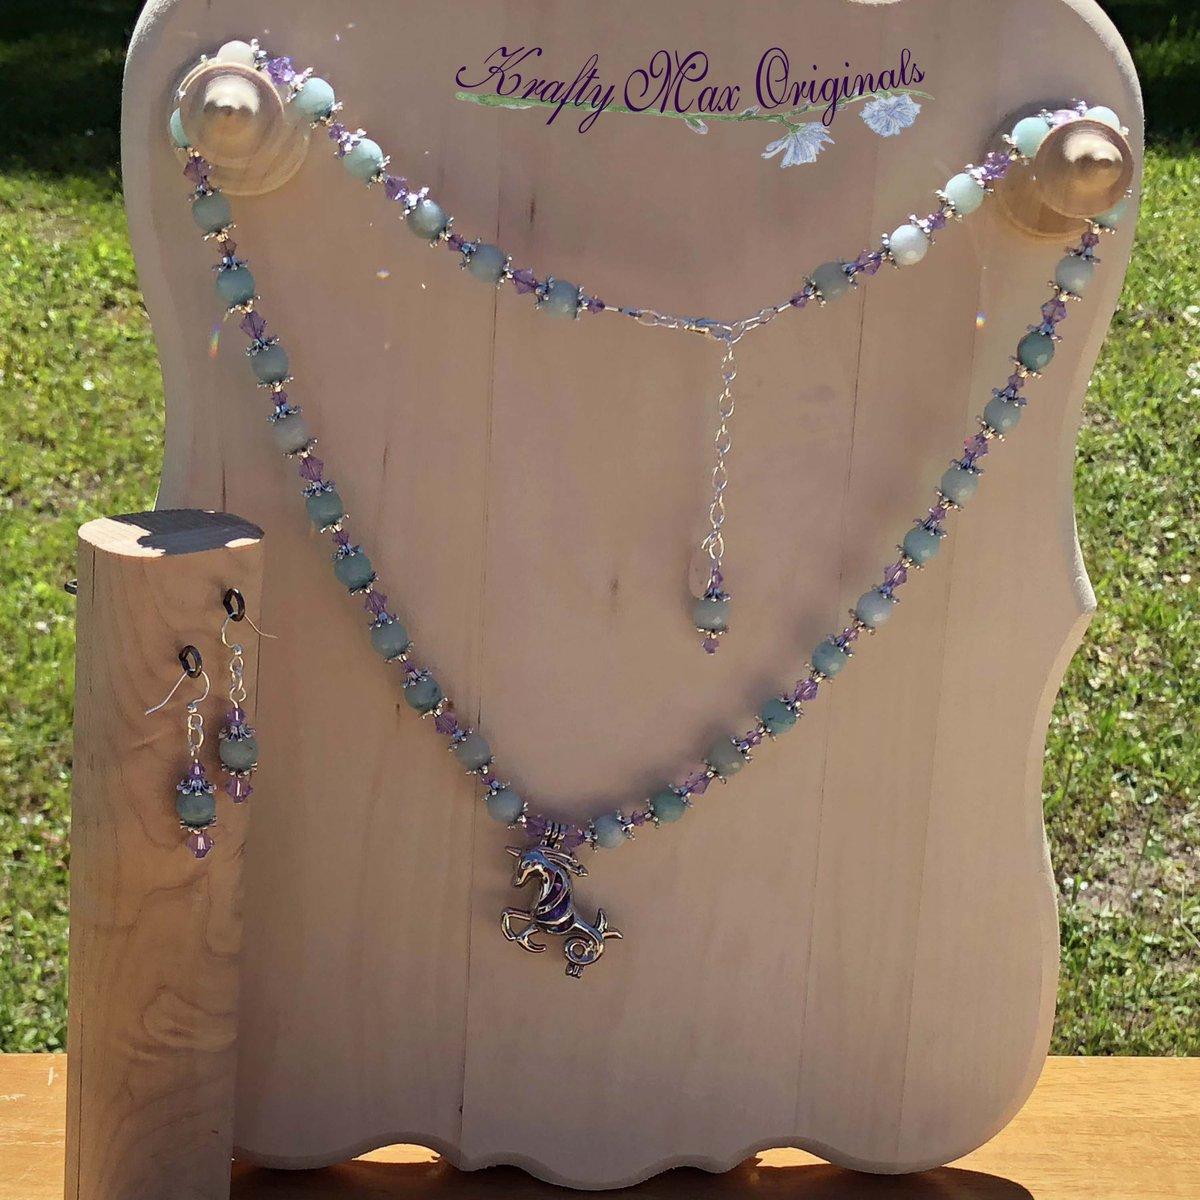 Purple Swarovski Crystals and Blue Gemstones Matched with a Unicorn Bead Cage Necklace Set $48  #handmade #jewelry #supporthandmade #buyhandmade #handmadelove #jewelrydesigner #jewelryart #uniquejewelry #handcrafted #kraftymax #kmax